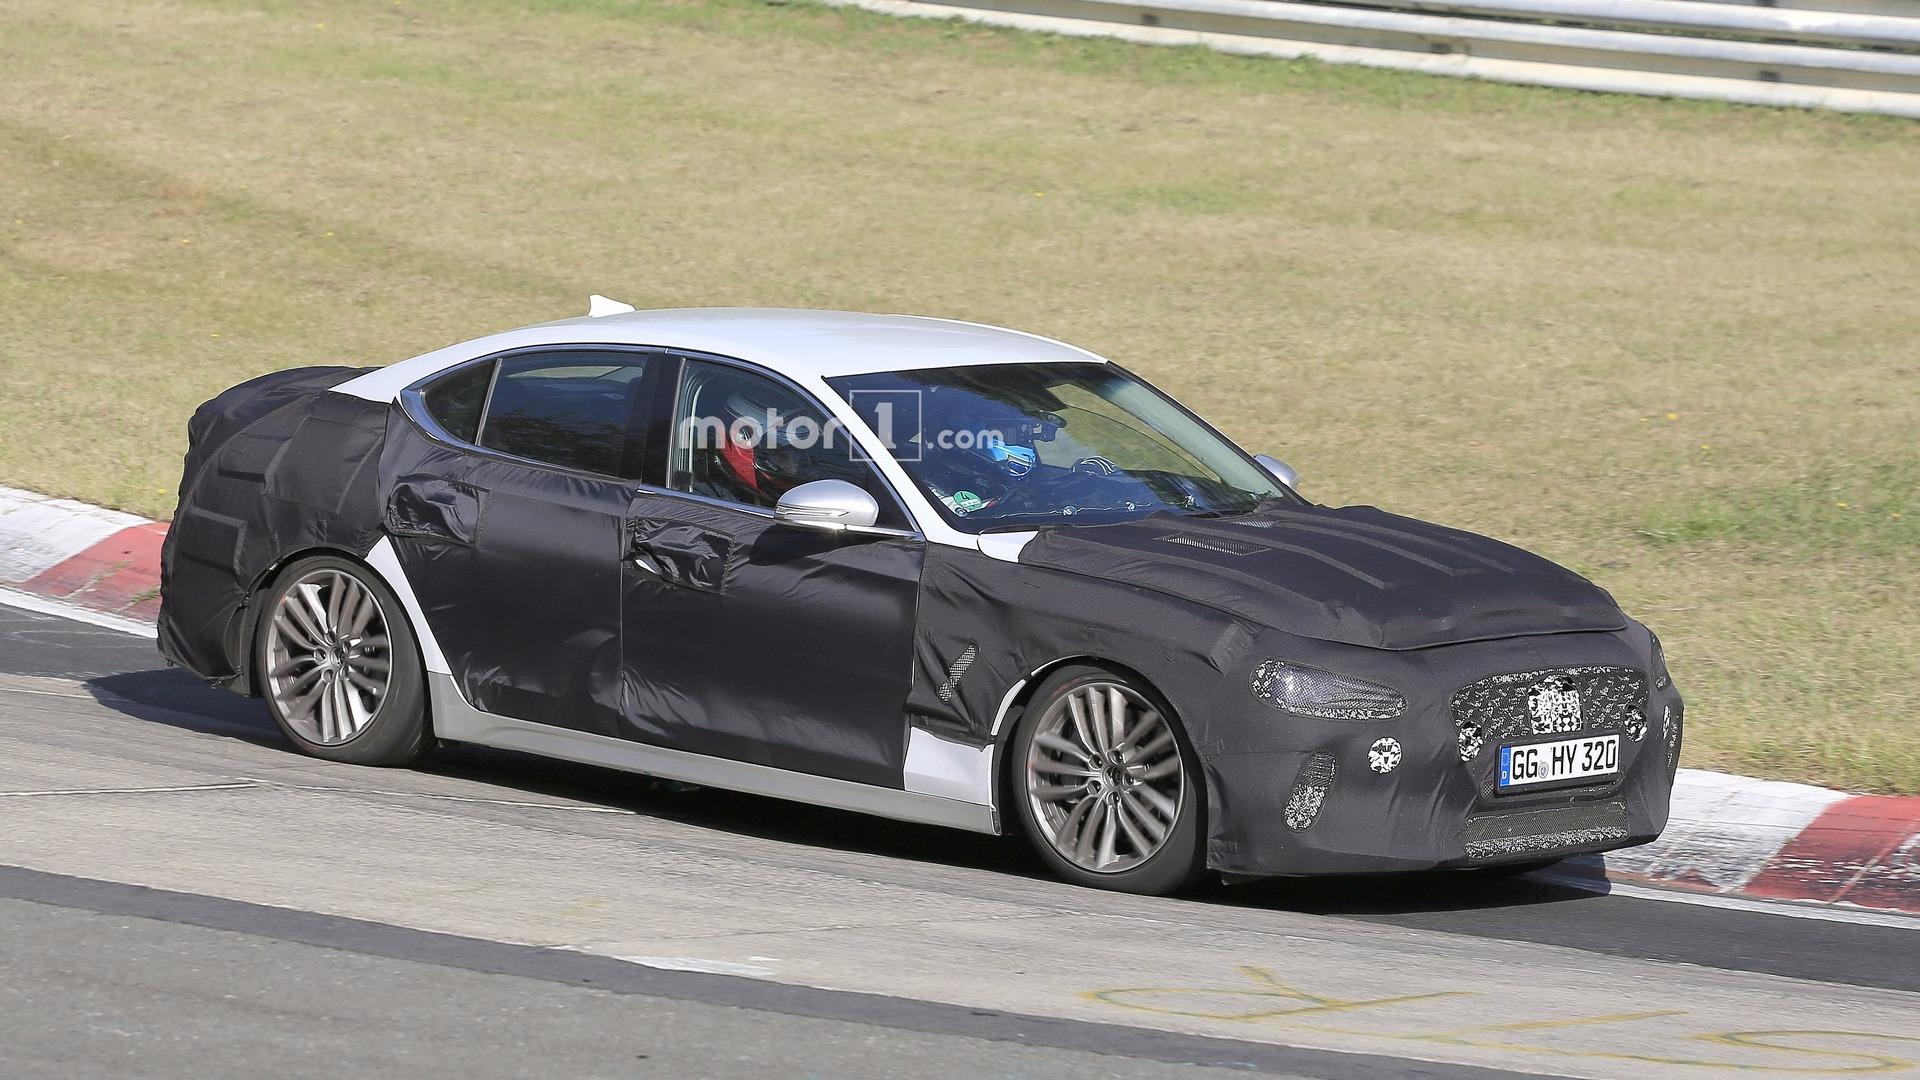 Genesis G70 looks promising while tackling the Nurburgring